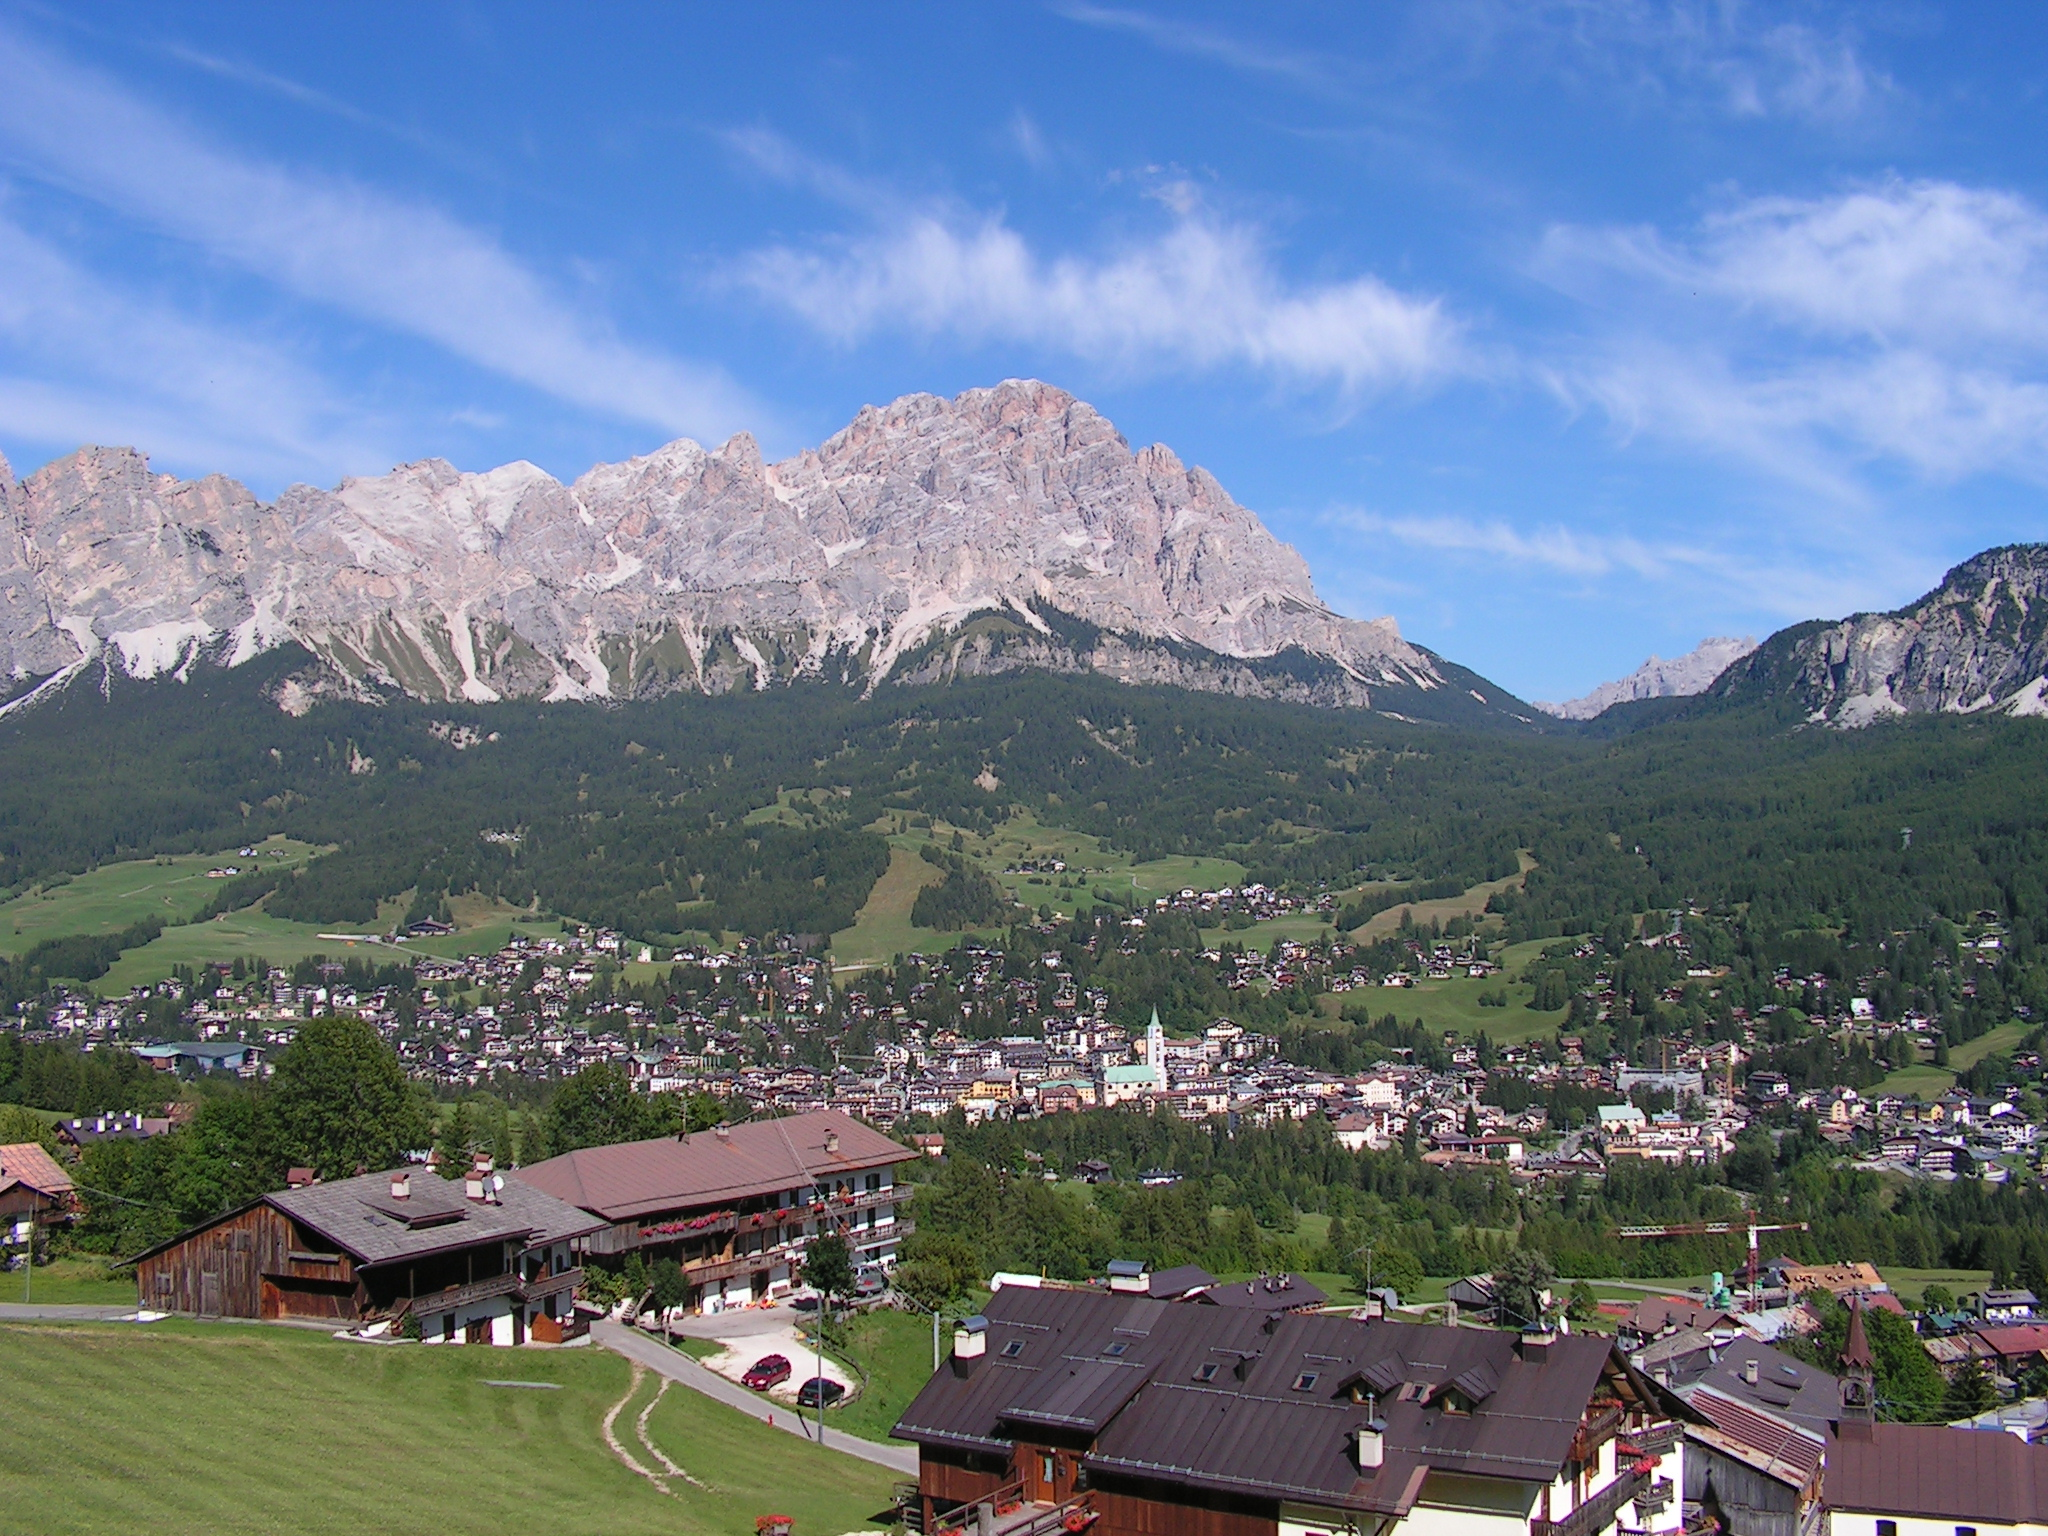 Image Cortina d'Ampezzo